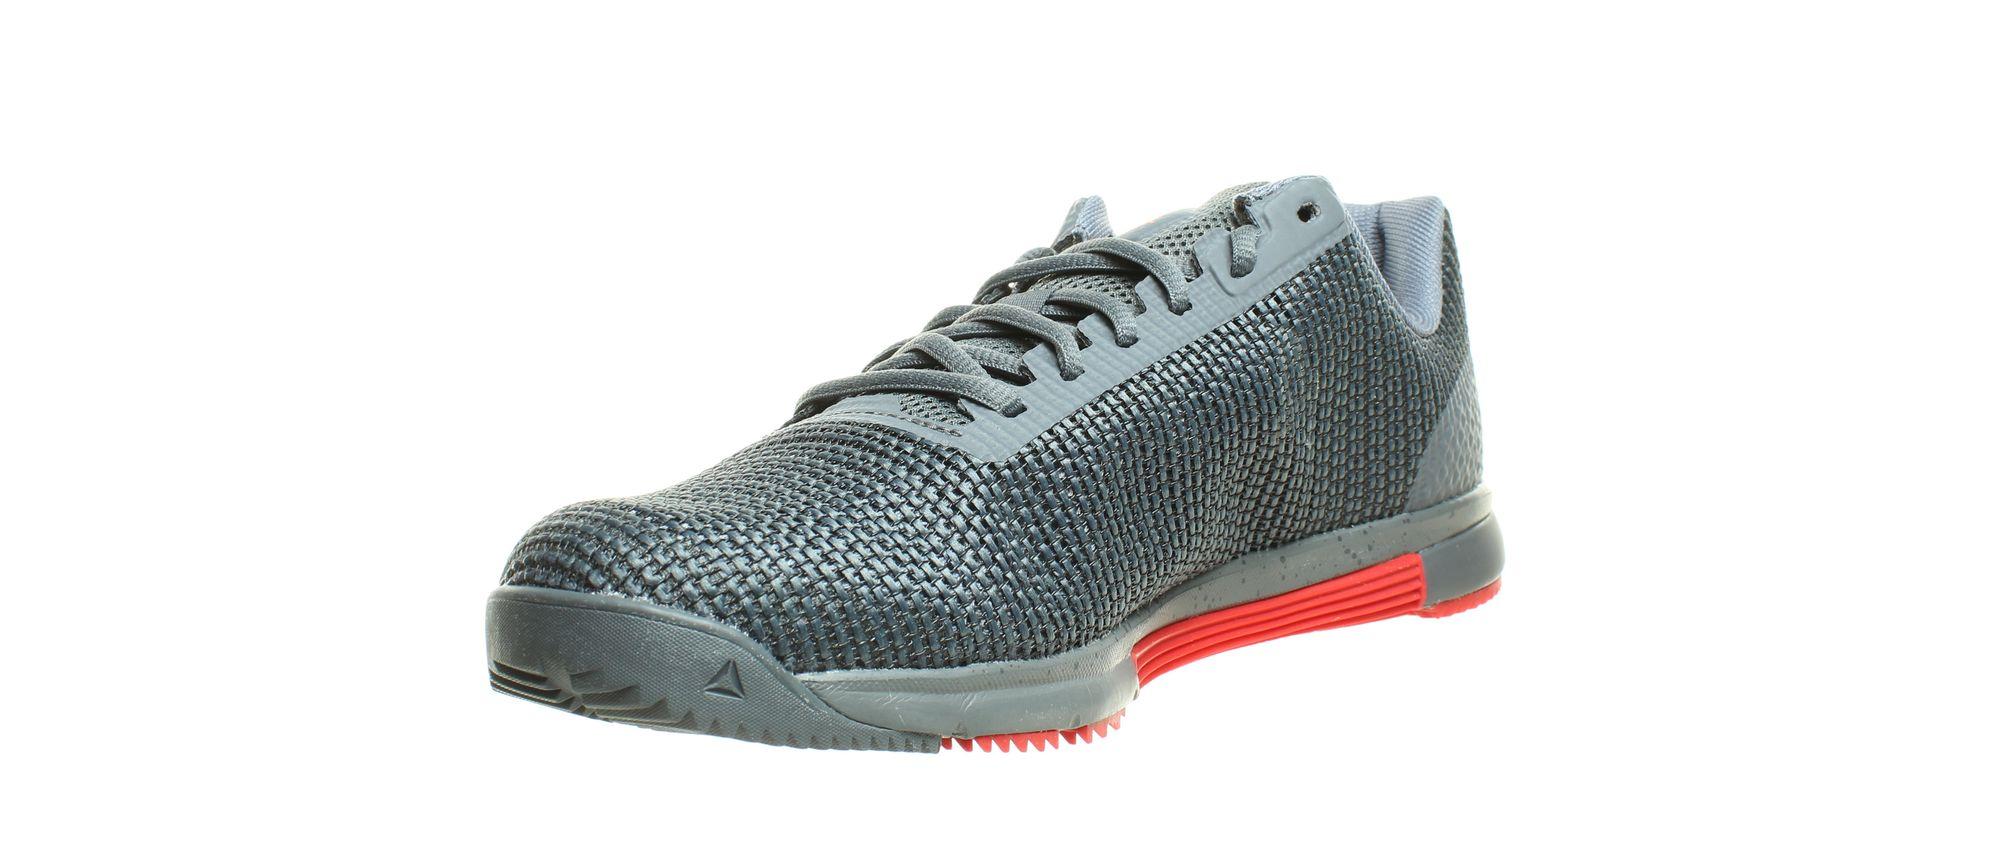 Reebok-Mens-Athletic-Speed-TR-Flexweave-Cross-Training-Shoes thumbnail 11